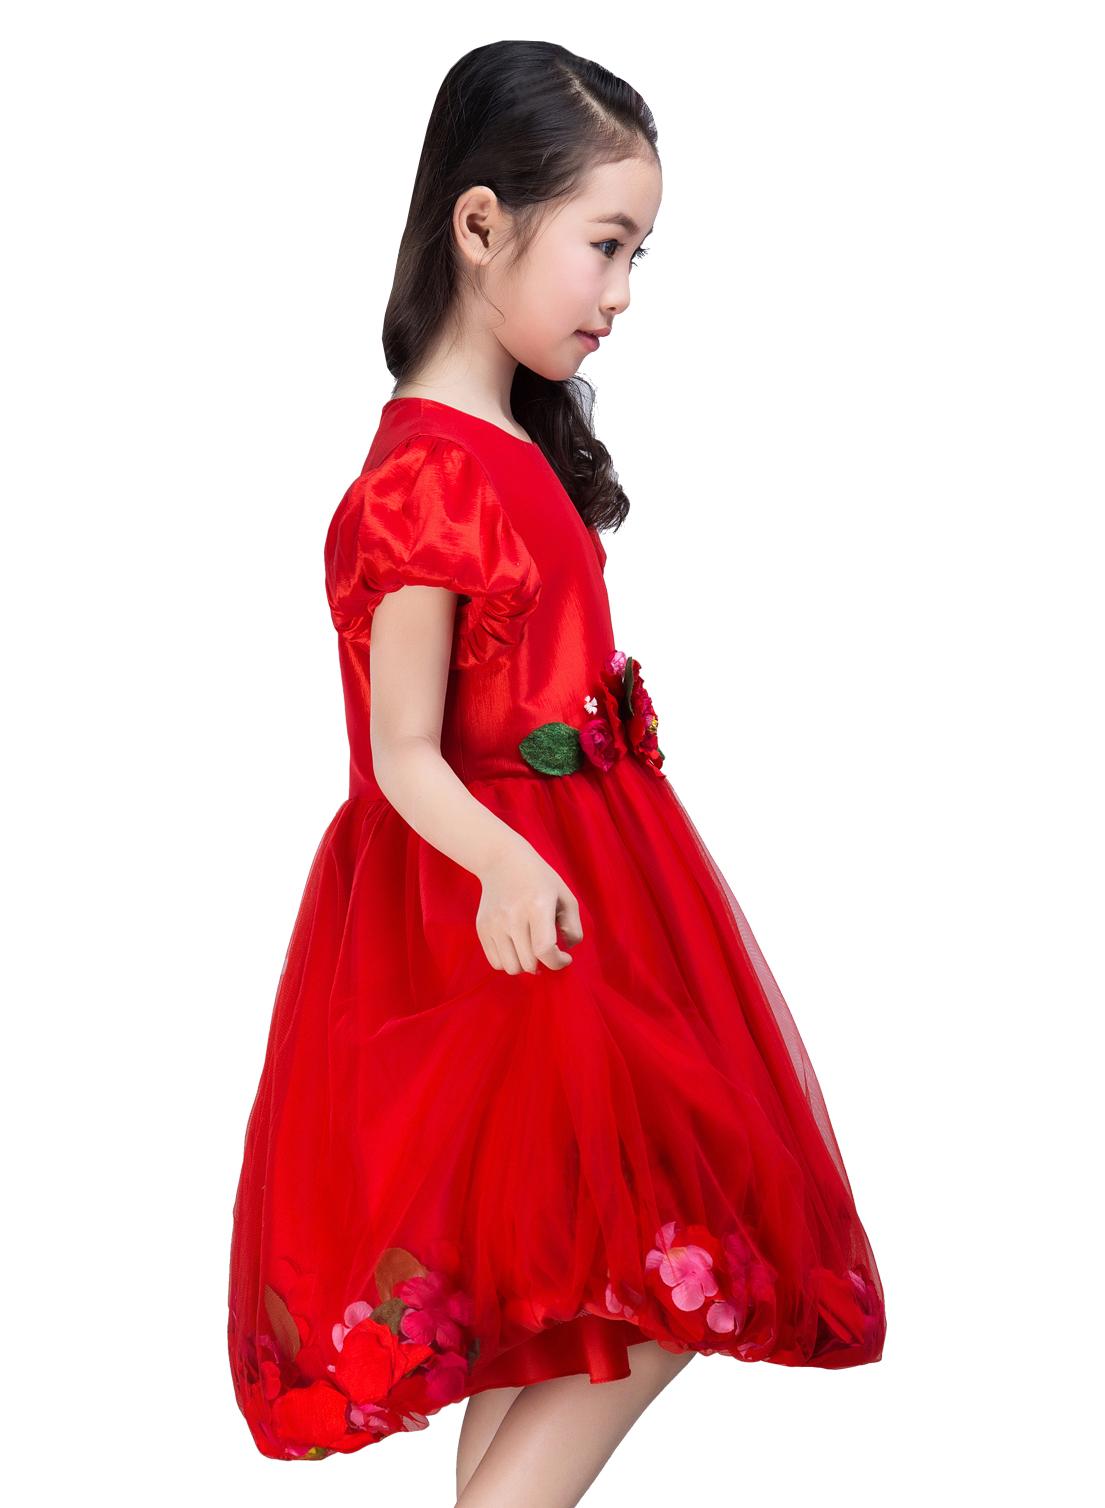 Emondora Flower Girl Dress Princess Formal Birthday Party Dresses